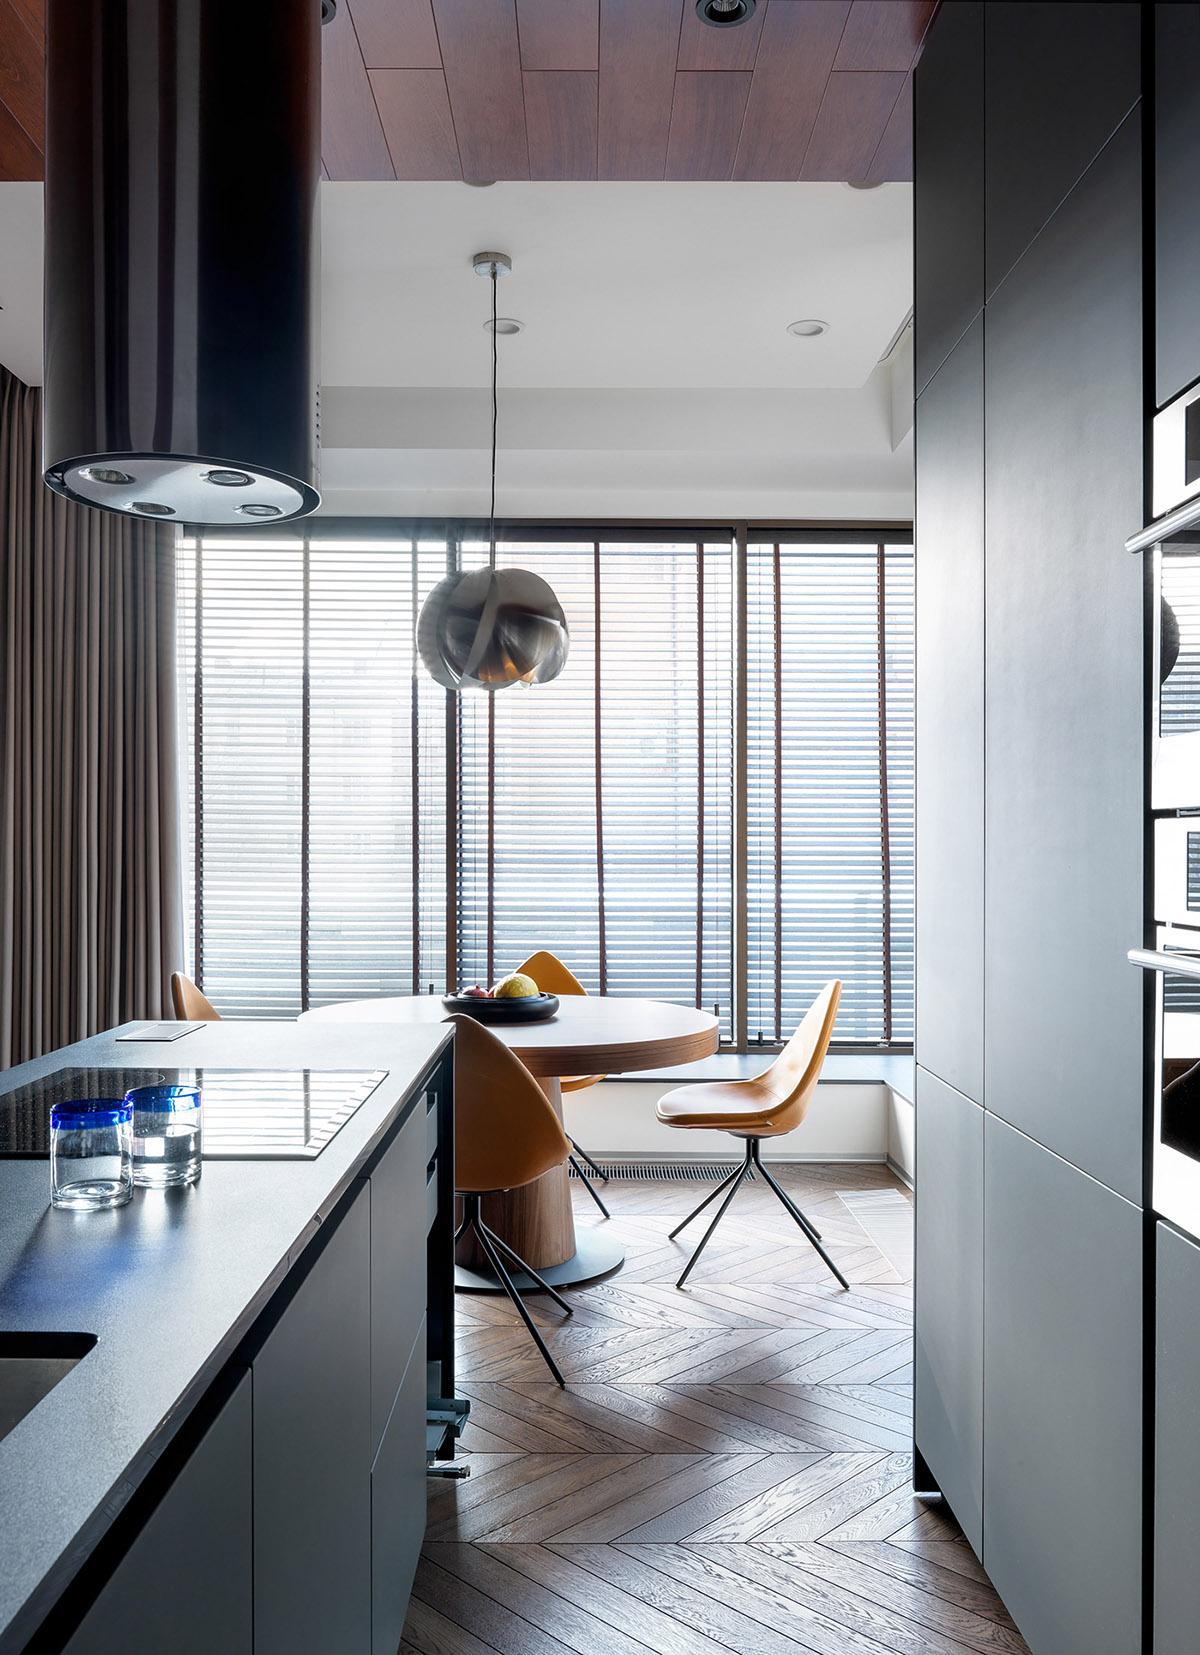 Interior Design Using Orange Amp Blue Tips To Help You